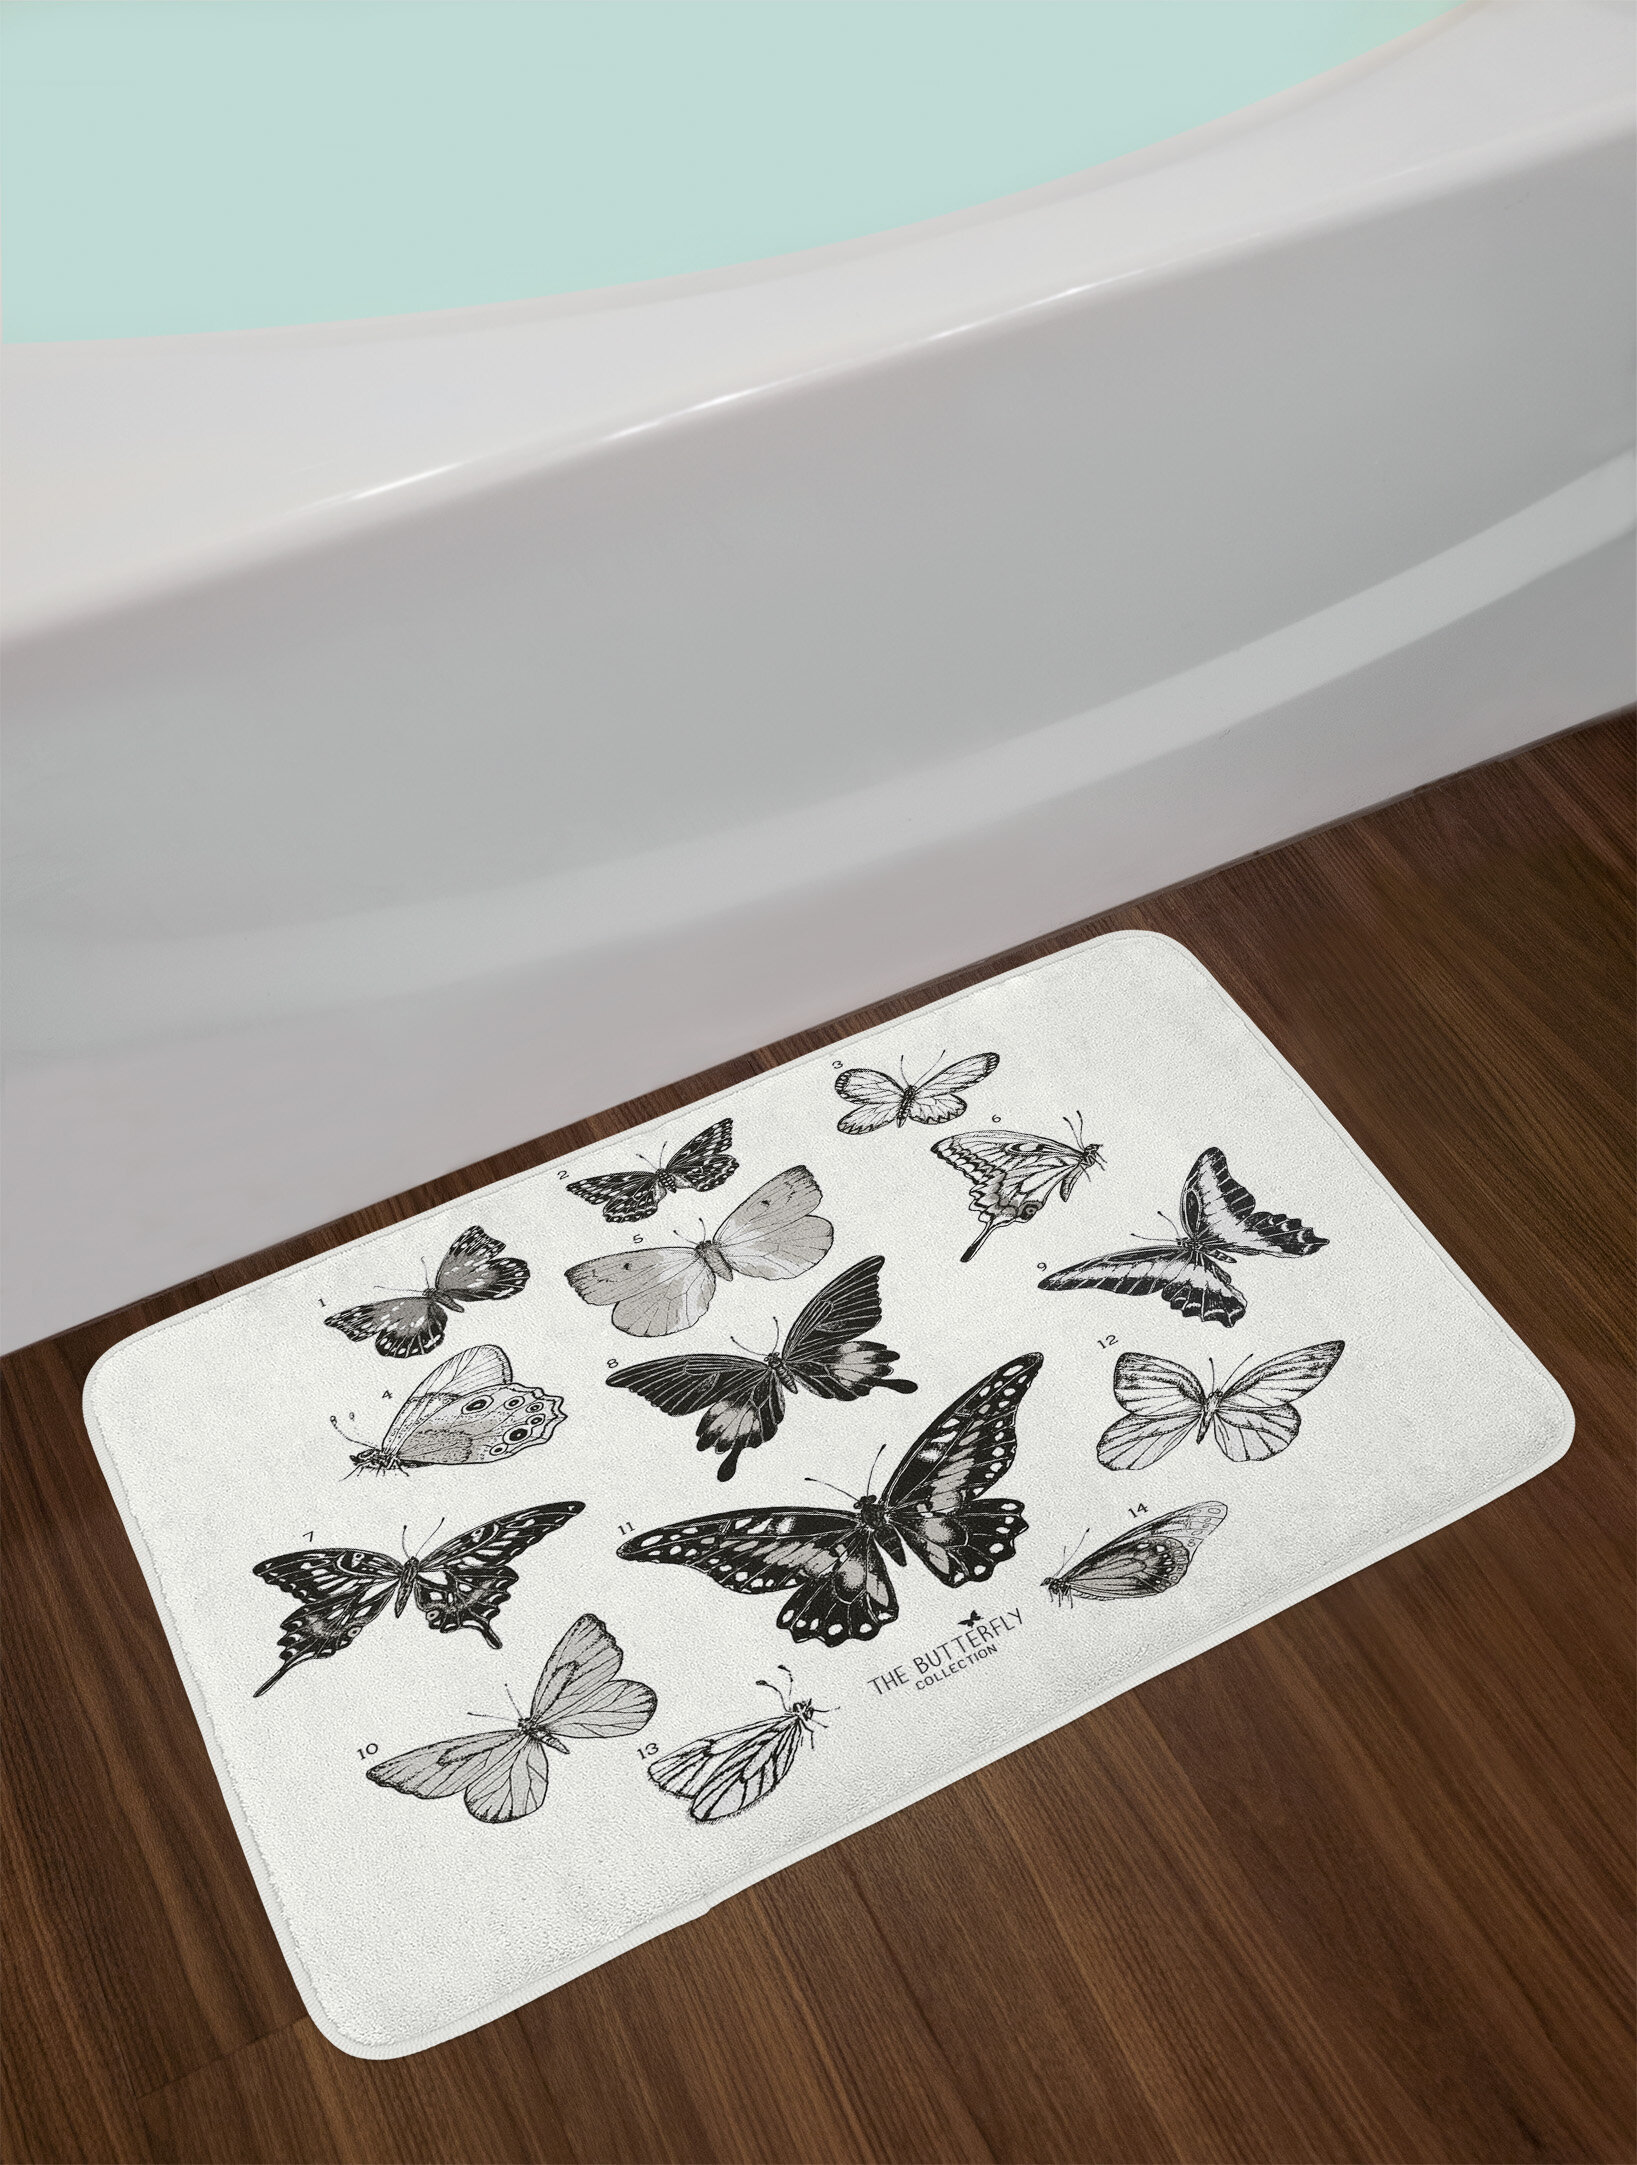 East Urban Home Erfly Large Collection Of Hand Drawn Erflies Realistic Artwork Non Slip Plush Bath Rug Wayfair